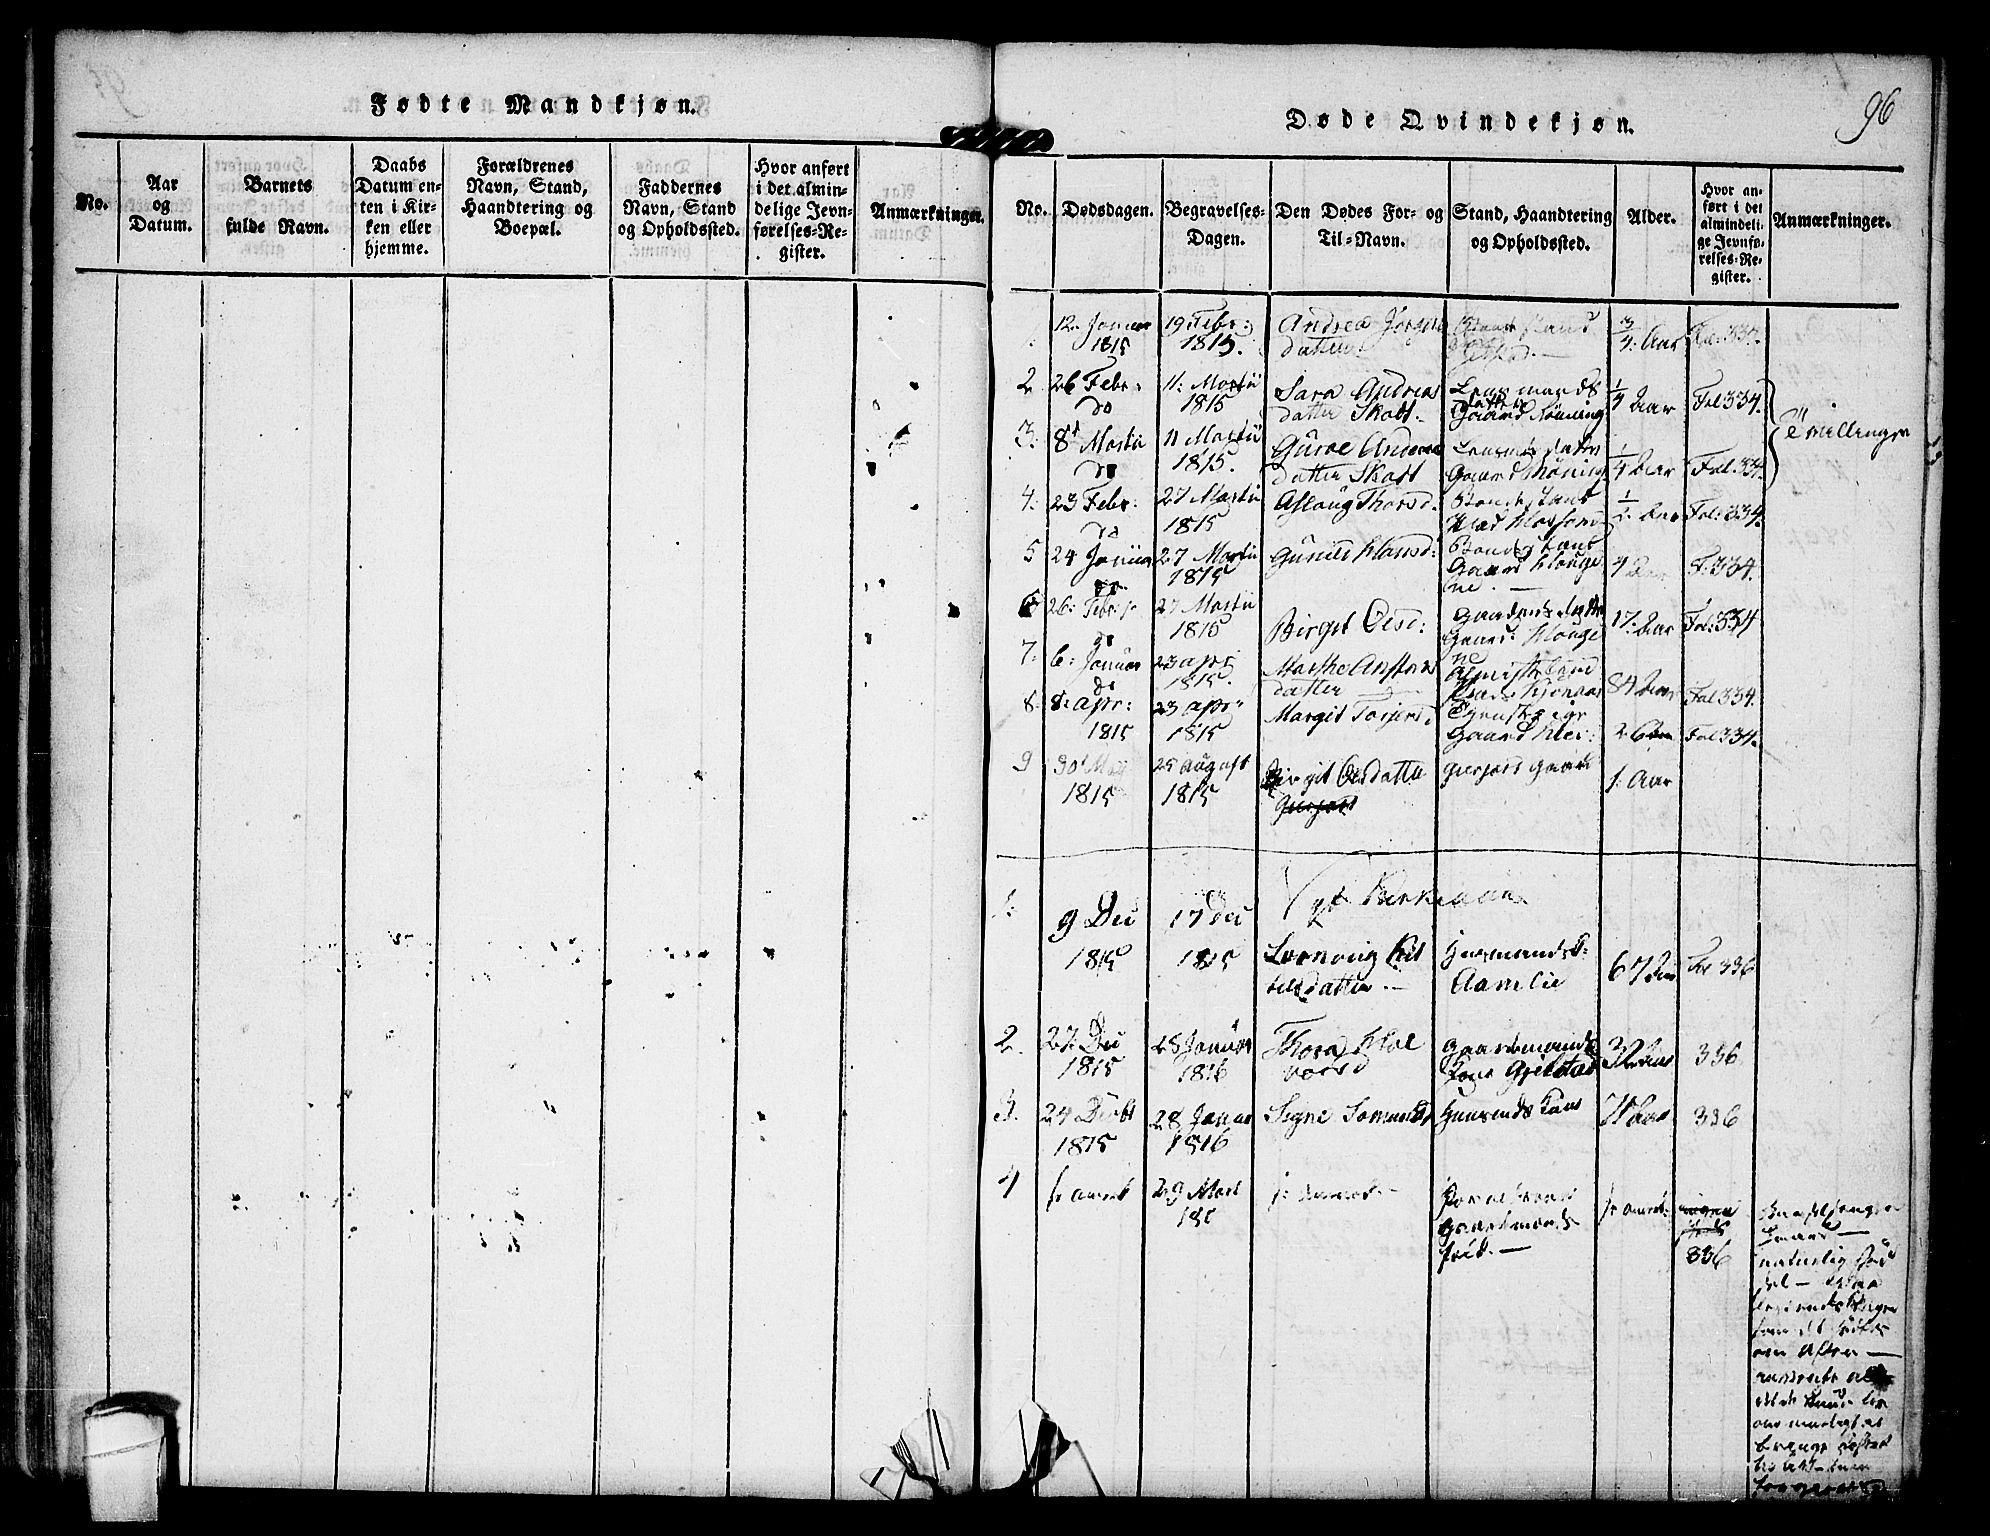 SAKO, Kviteseid kirkebøker, F/Fb/L0001: Ministerialbok nr. II 1, 1815-1836, s. 96